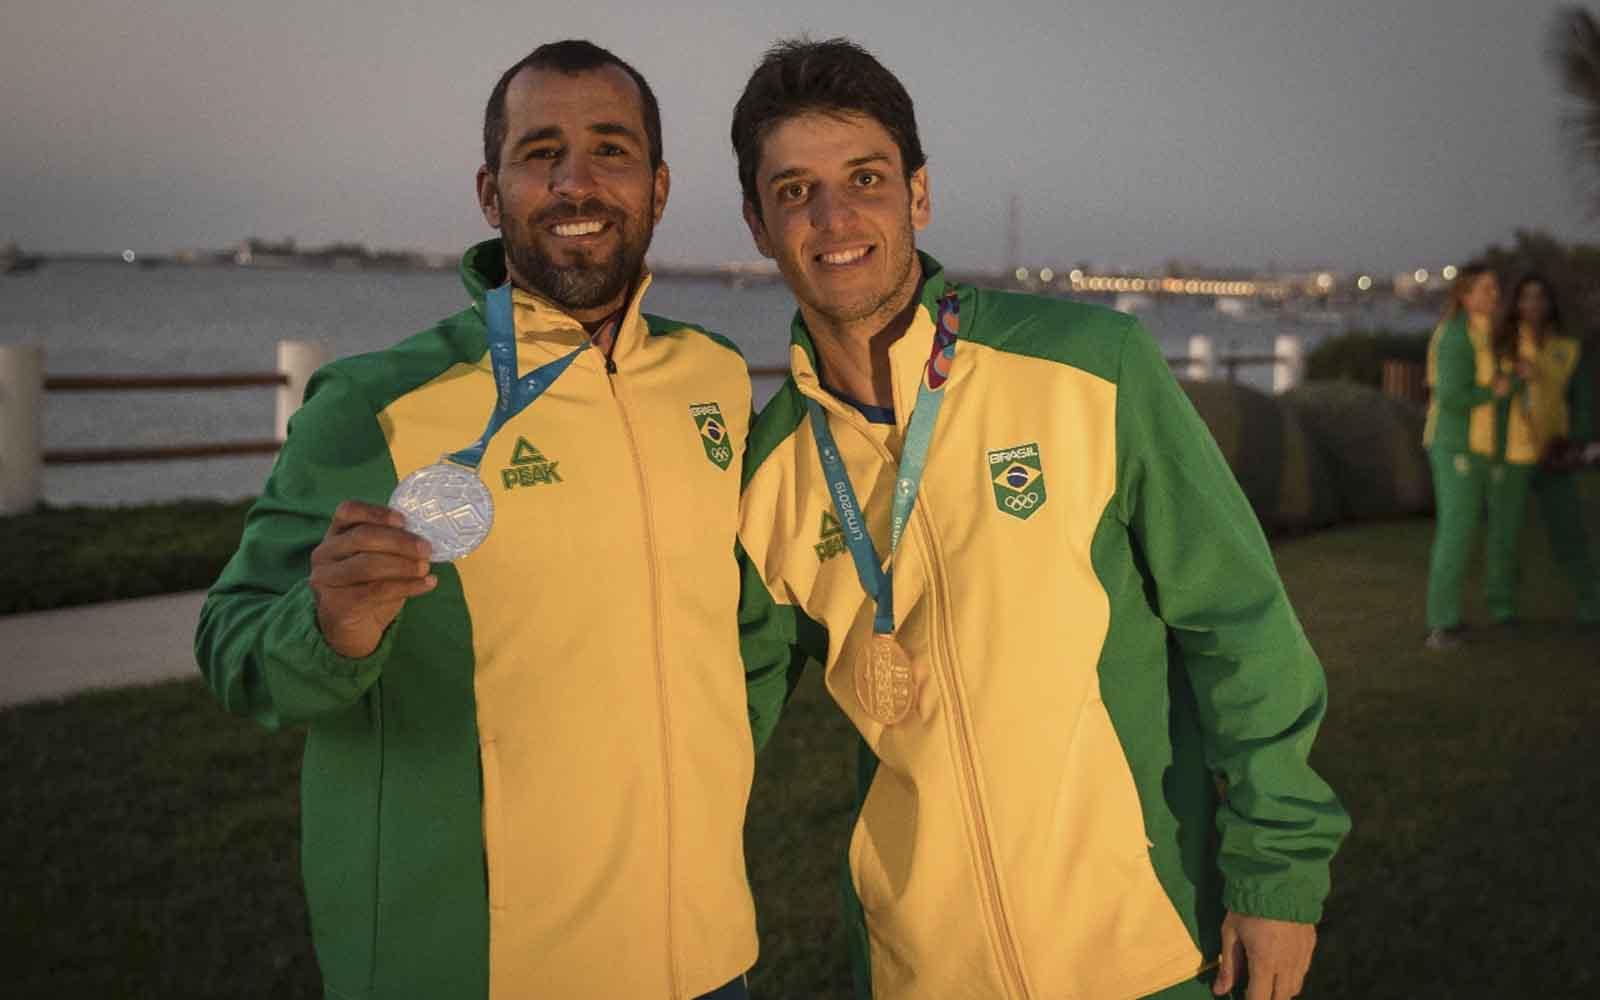 Matheus Dellagnelo e Bruno Fontes medalhas de ouro e prata vela pan americano - boat shopping